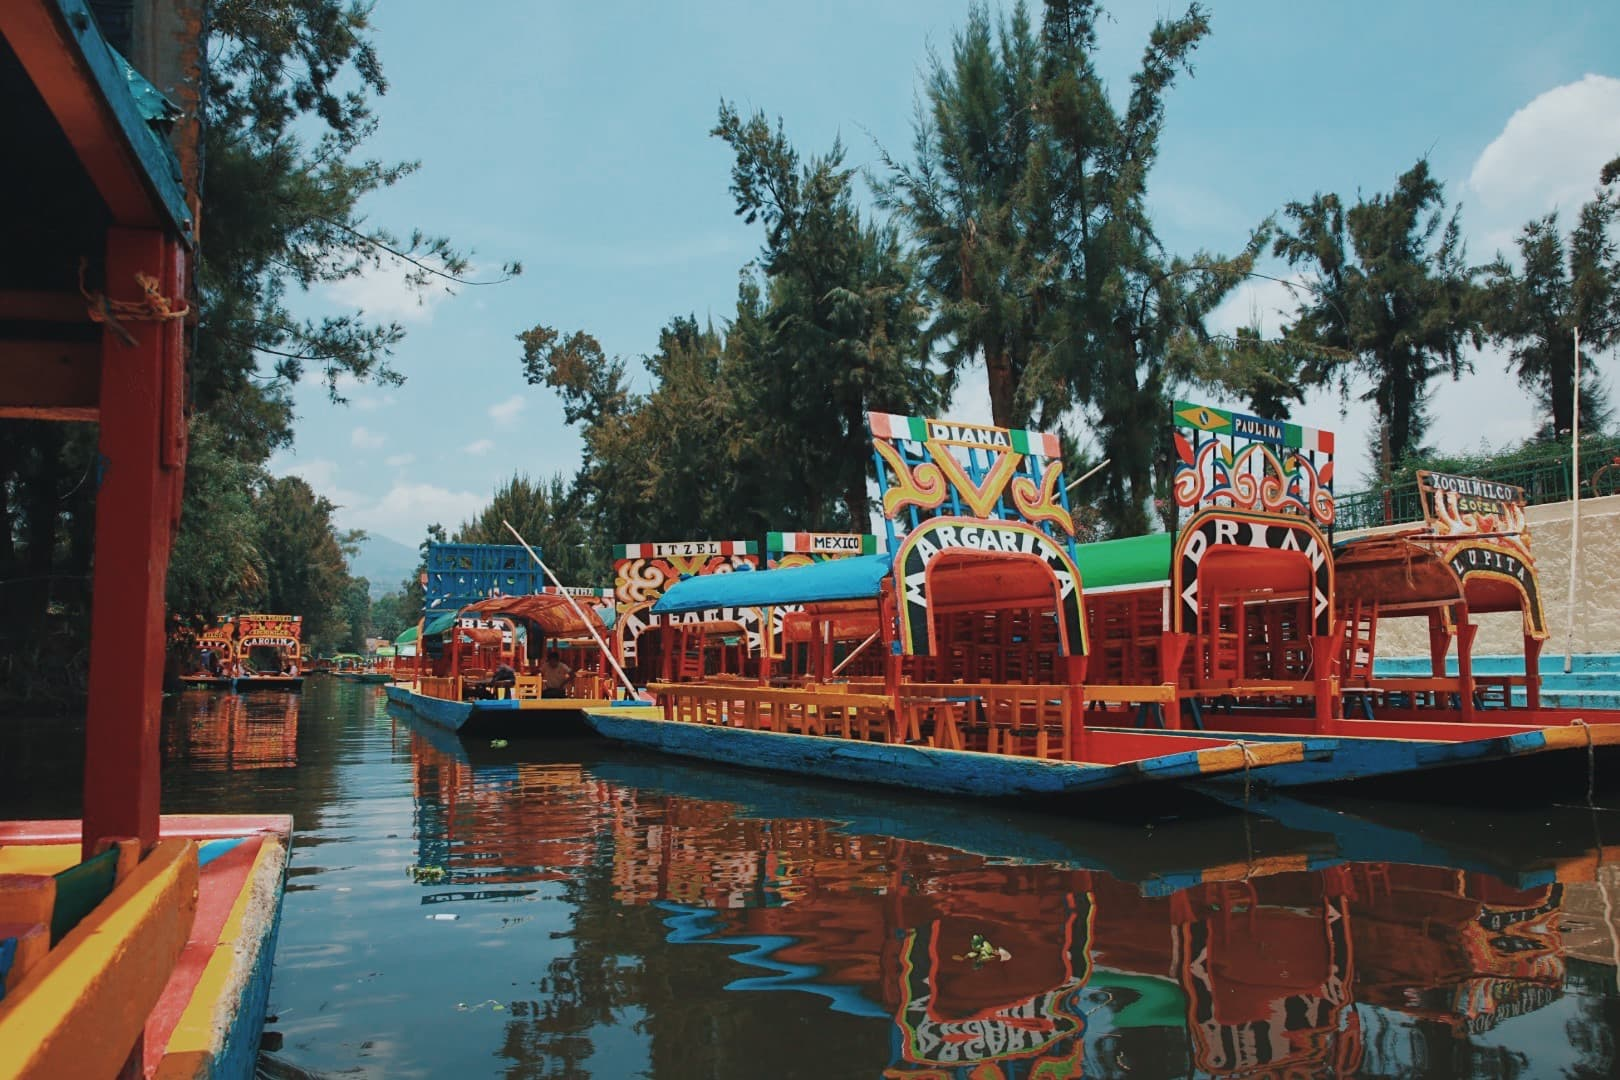 Day 2 - Floating markets of Xochimilco